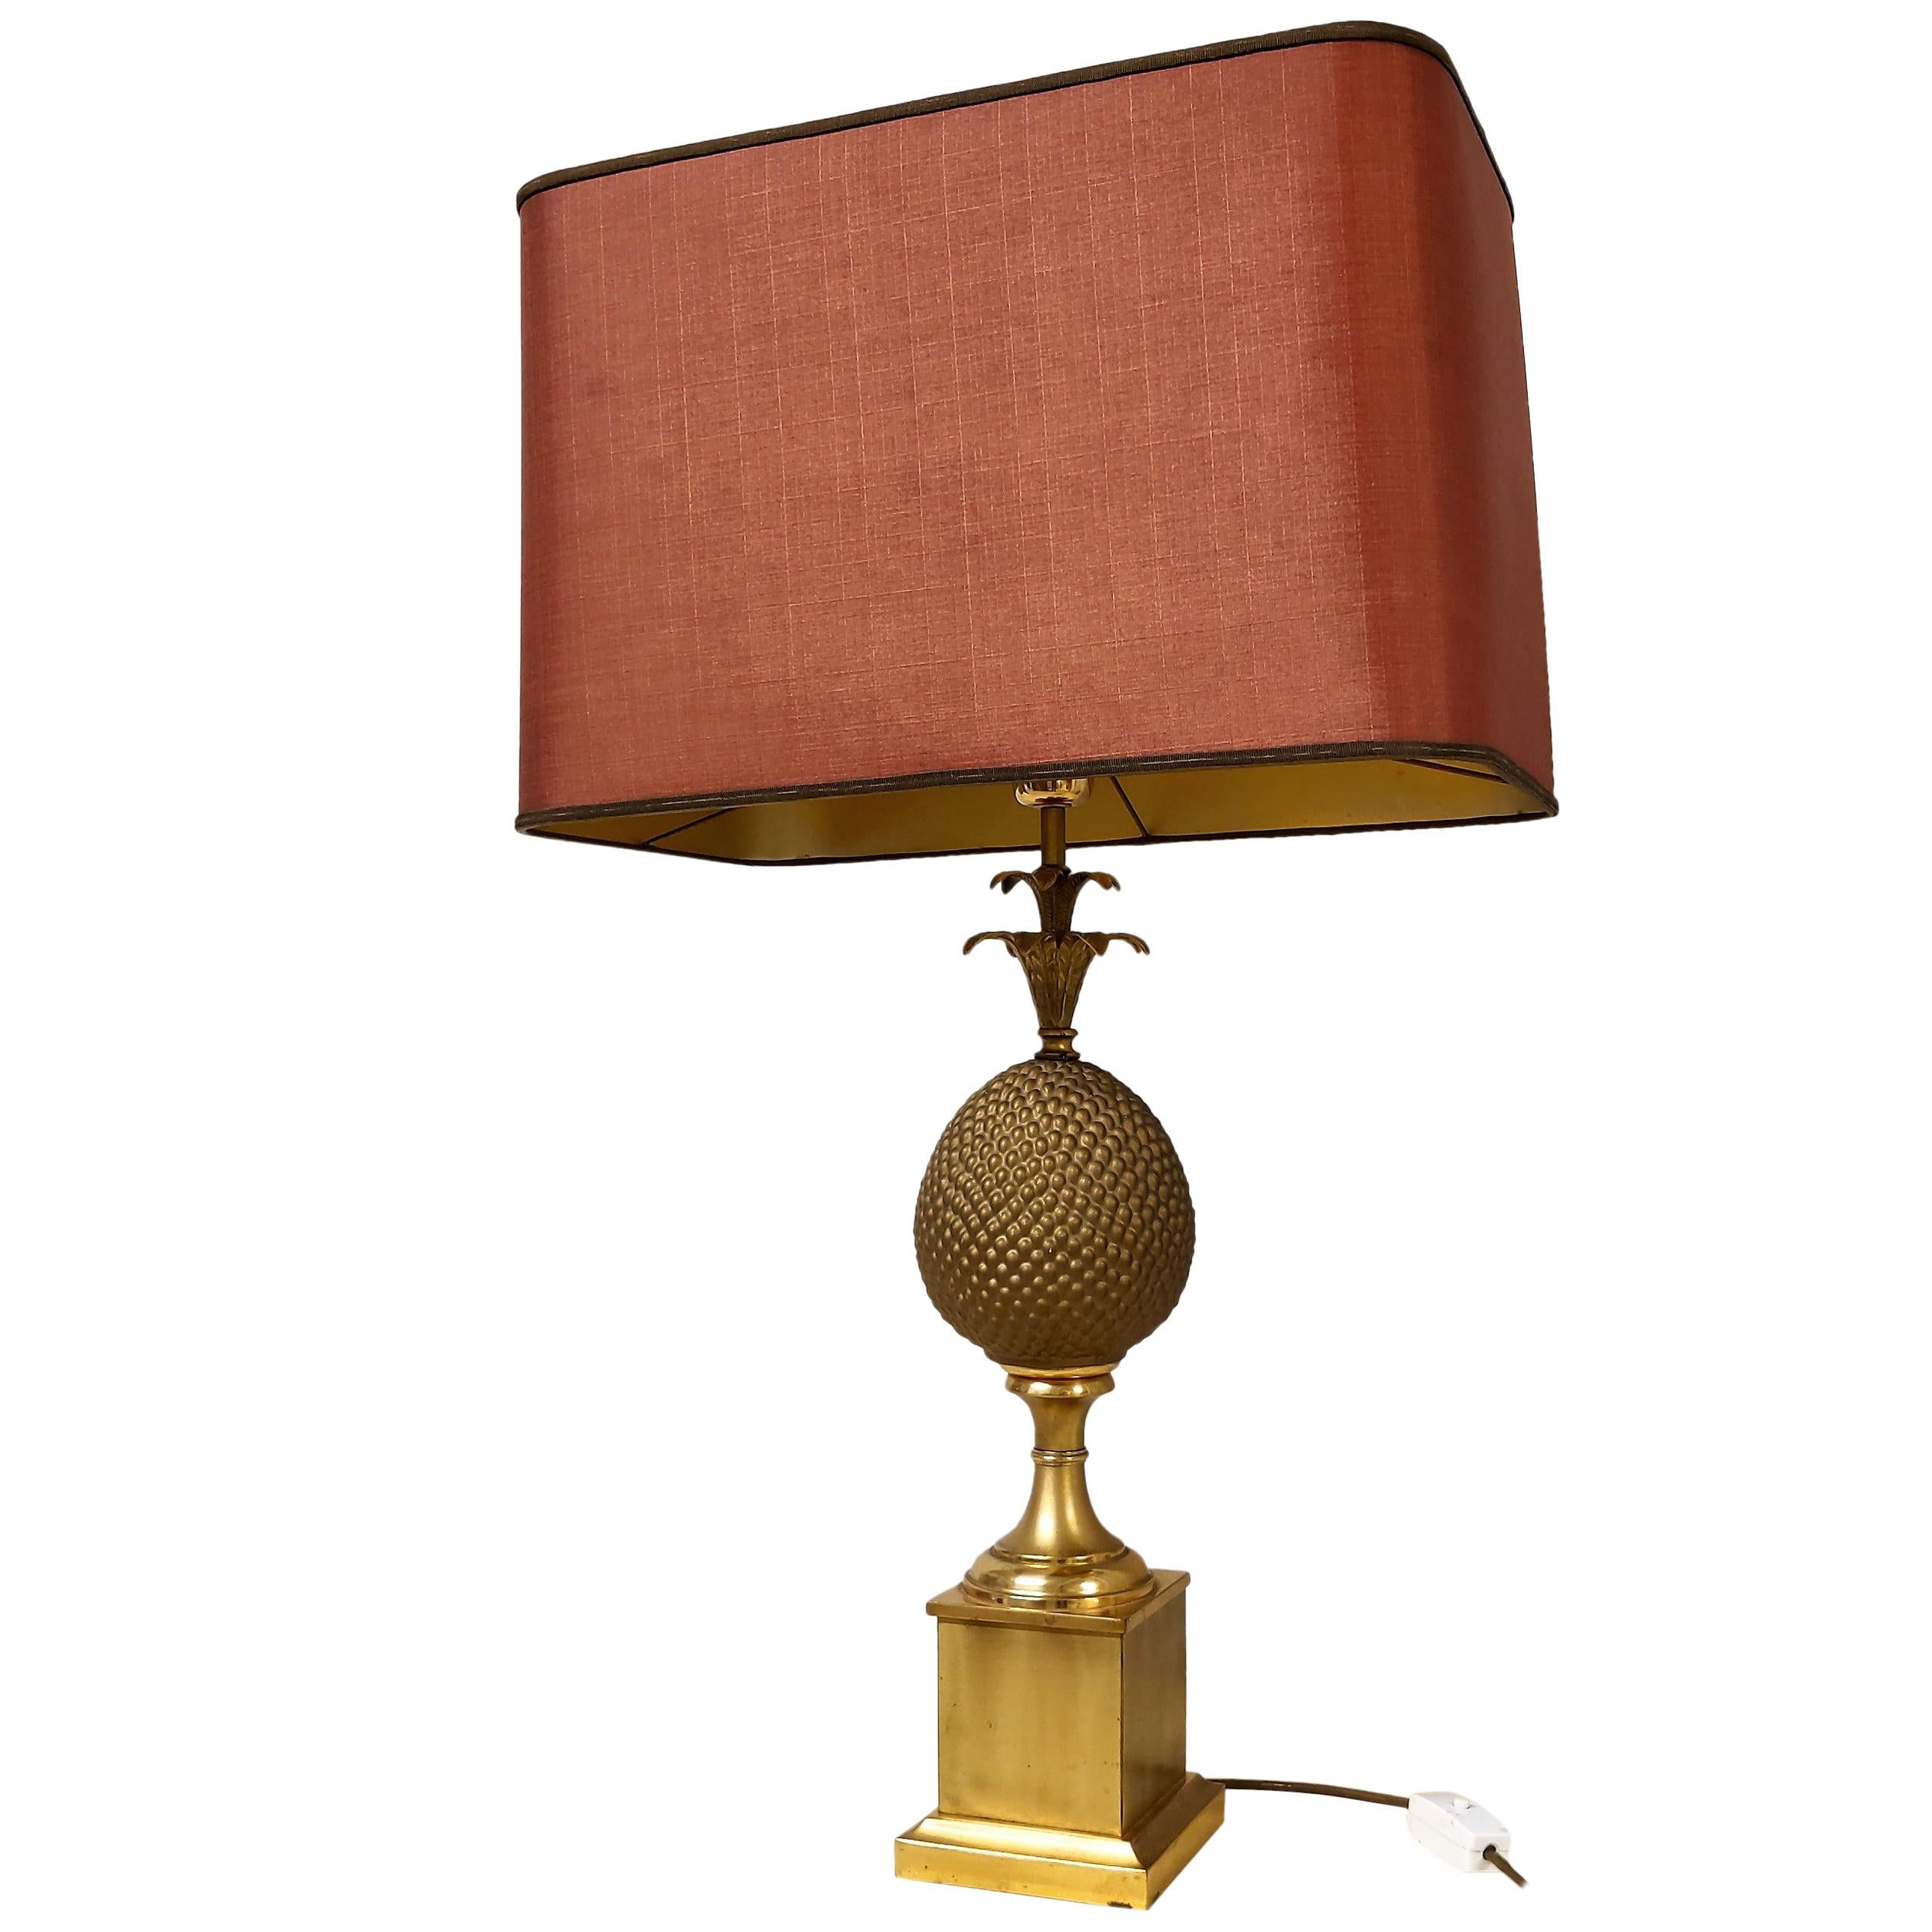 Brass Pineapple Table Lamp, 1970s